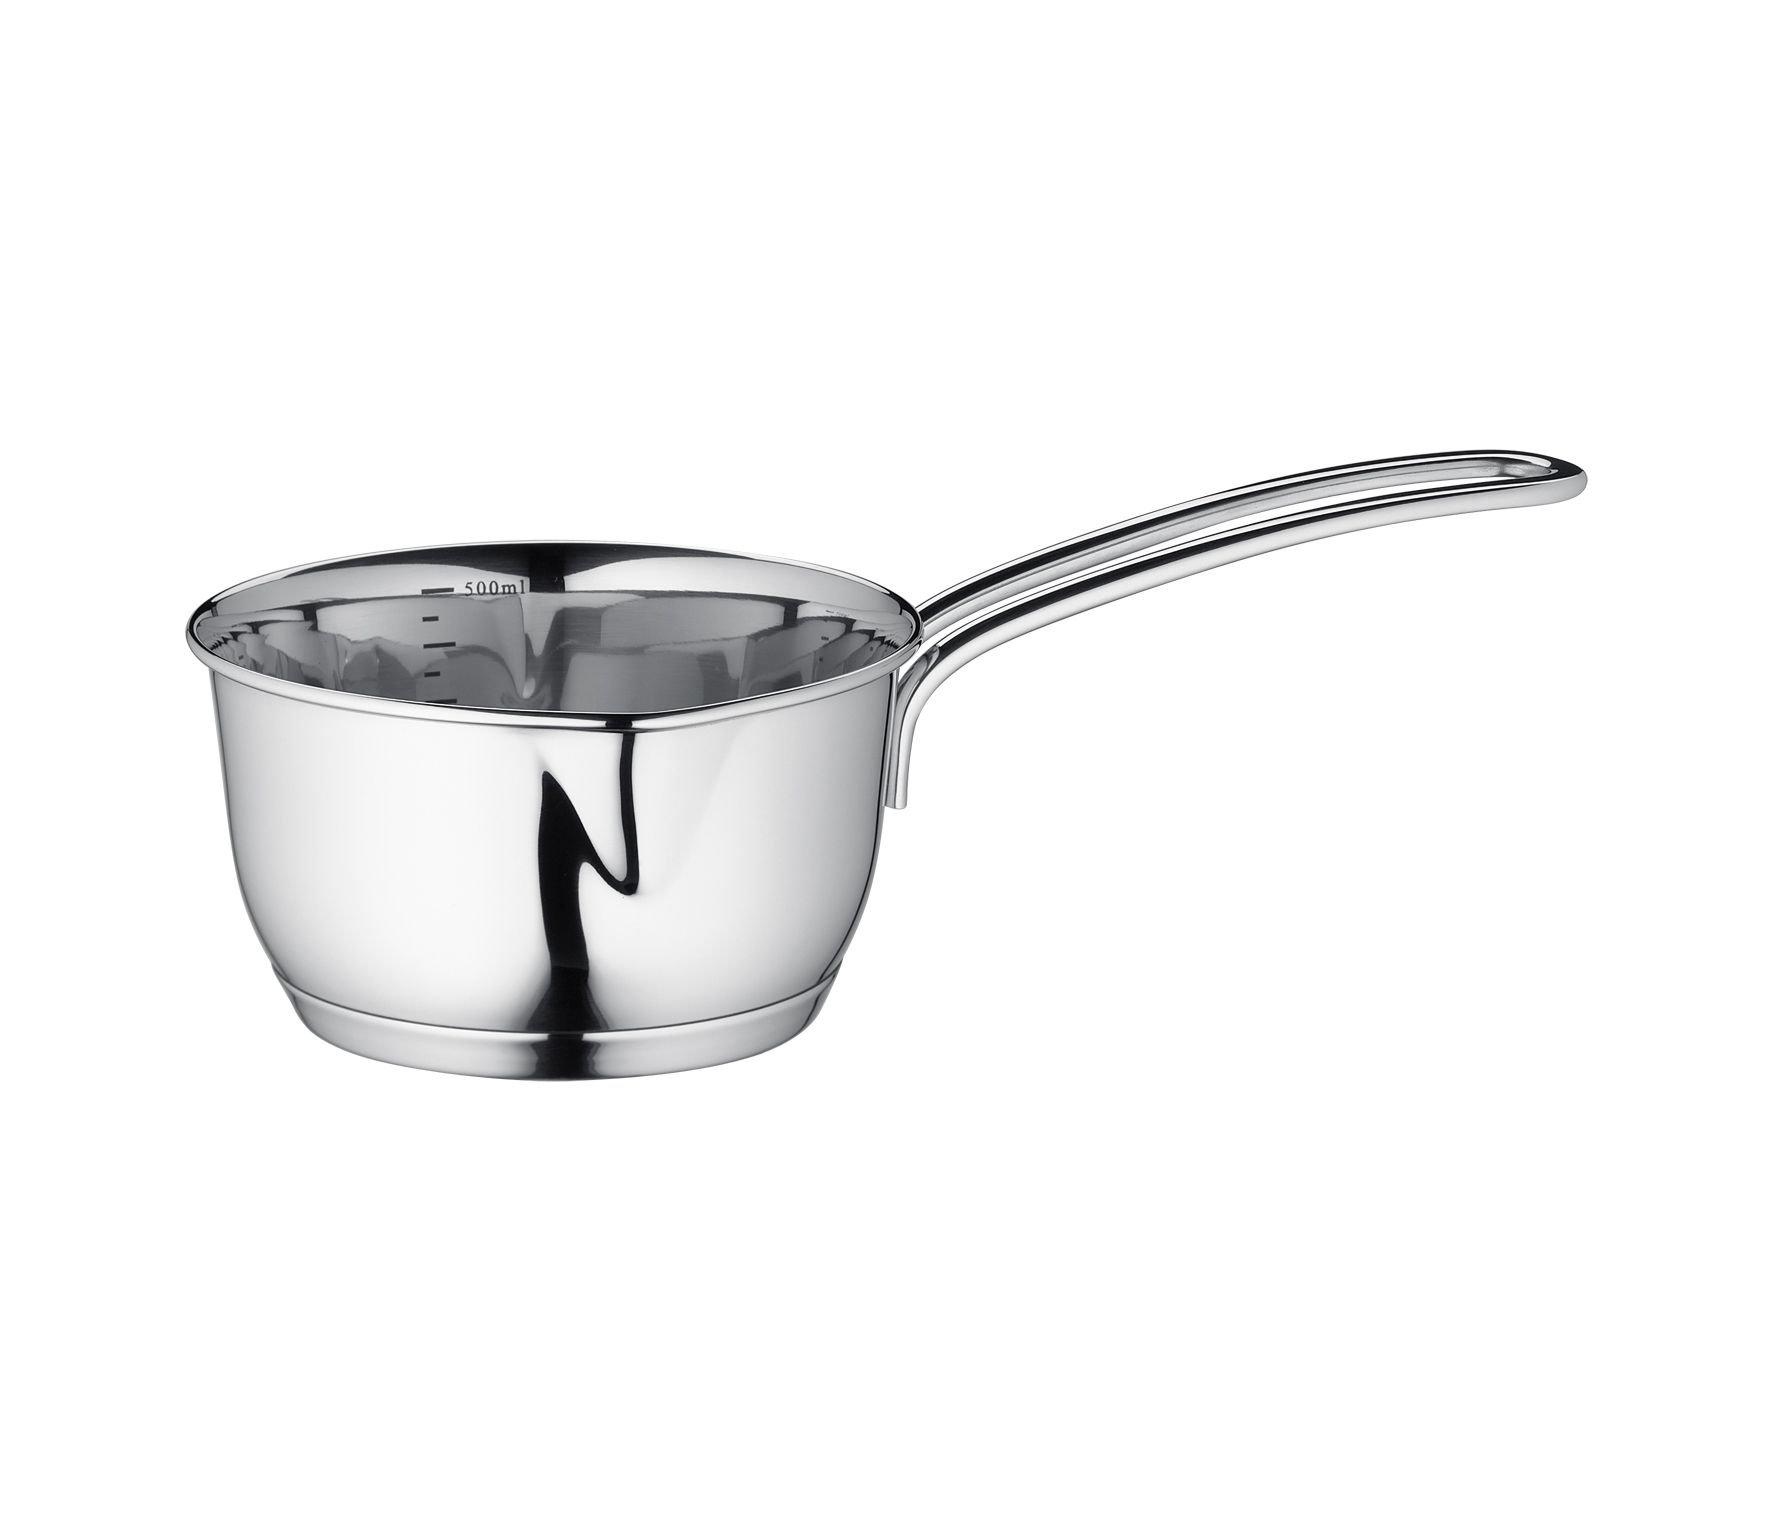 Kuchenprofi Stainless Steel Saucepan with Clad Bottom, 16-Ounce